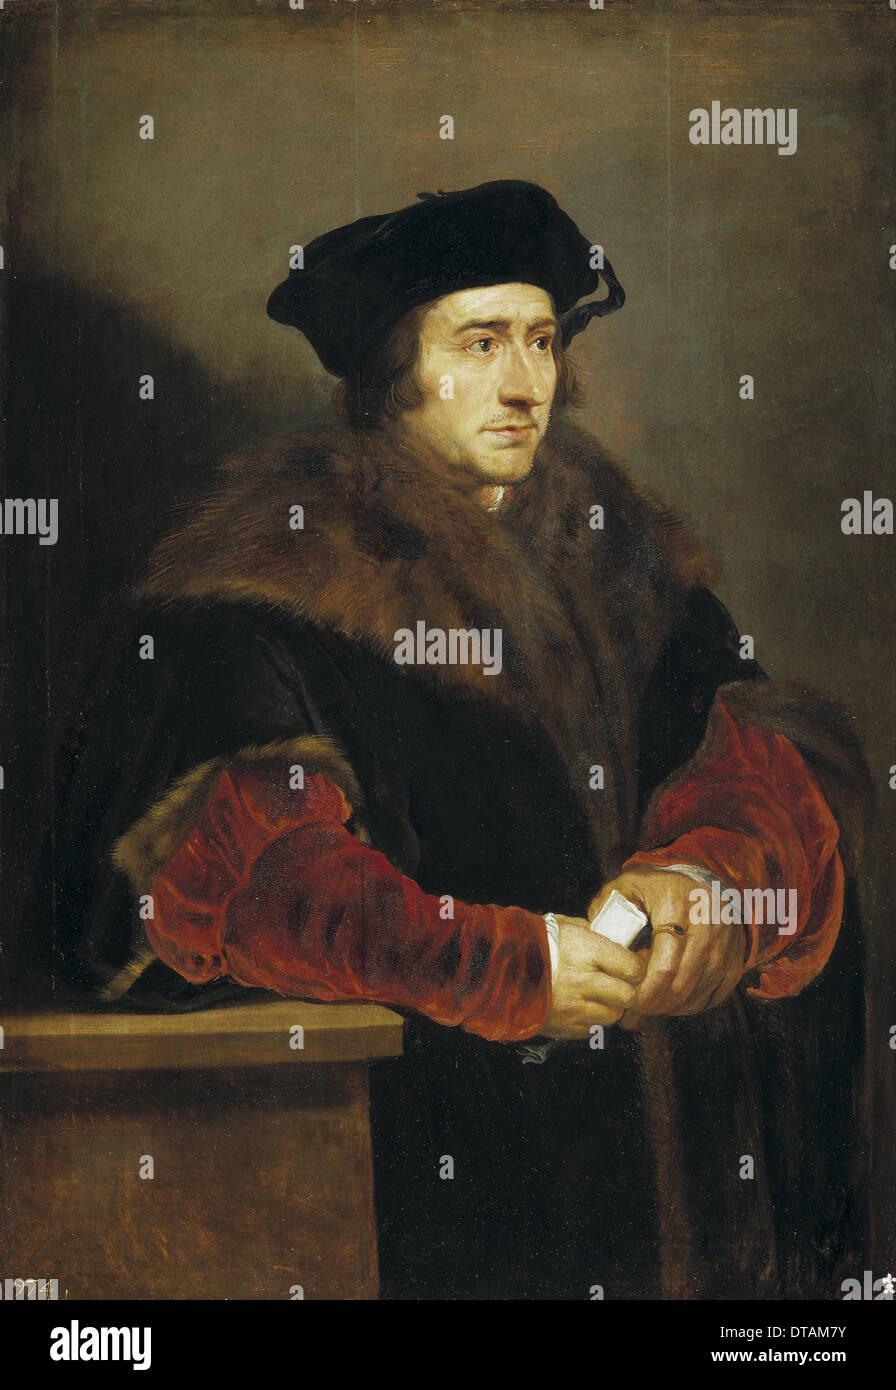 Portrait of Sir Thomas More, 1625-1630. Artist: Rubens, Pieter Paul (1577-1640) - Stock Image